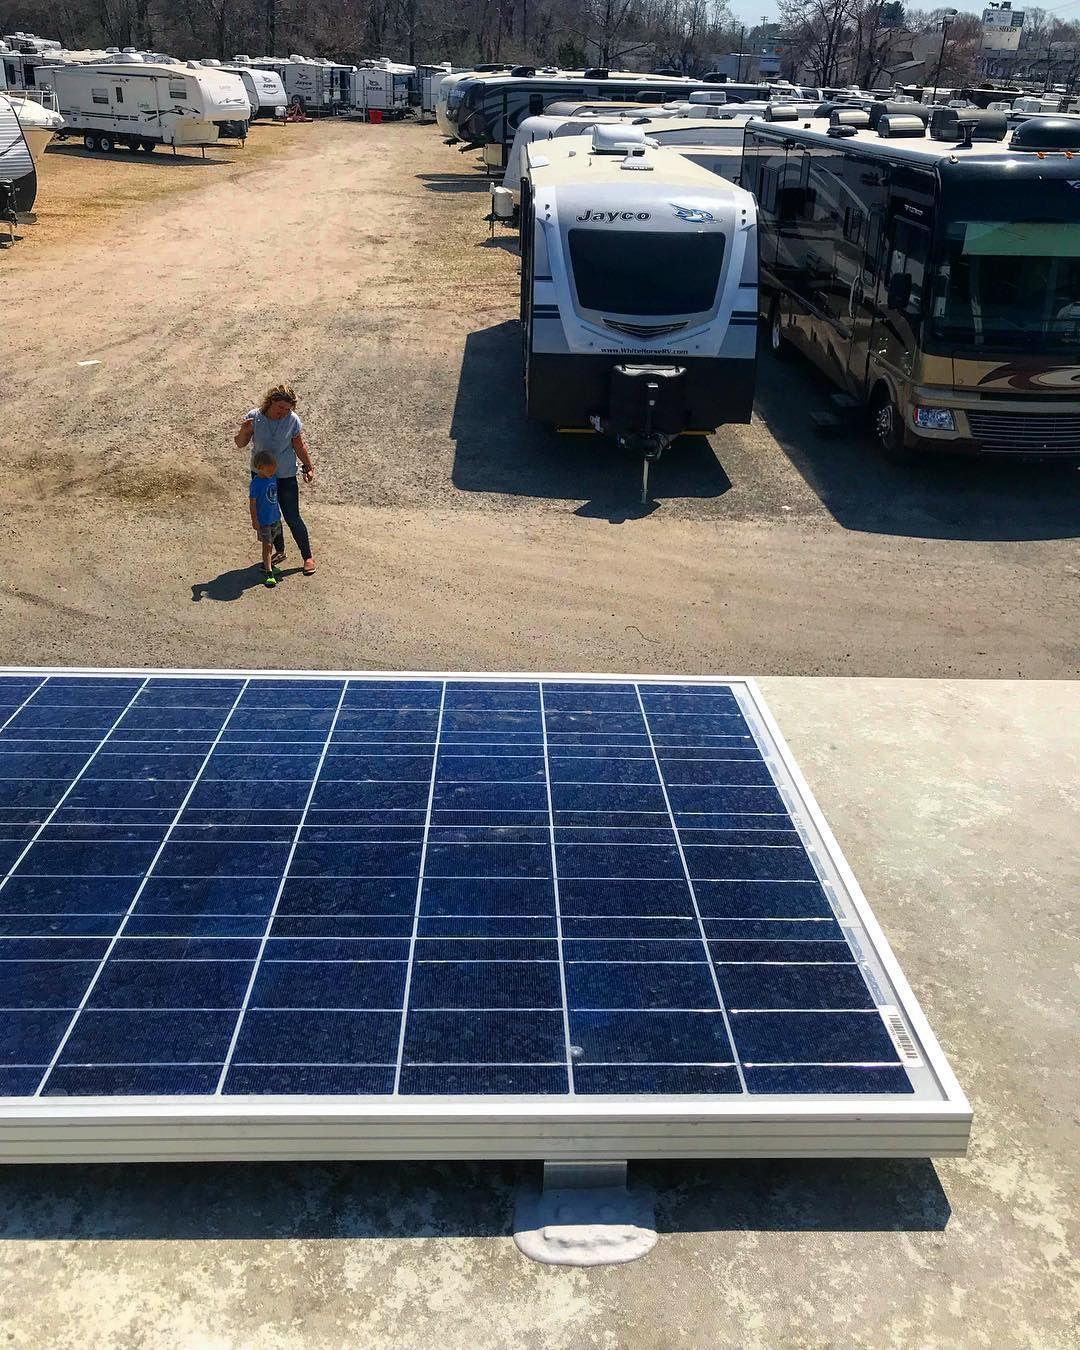 Rv Solar 101 With Go Power Sizing A Solar Kit For Your Rv Rv Solar Solar Panels Solar Energy Panels